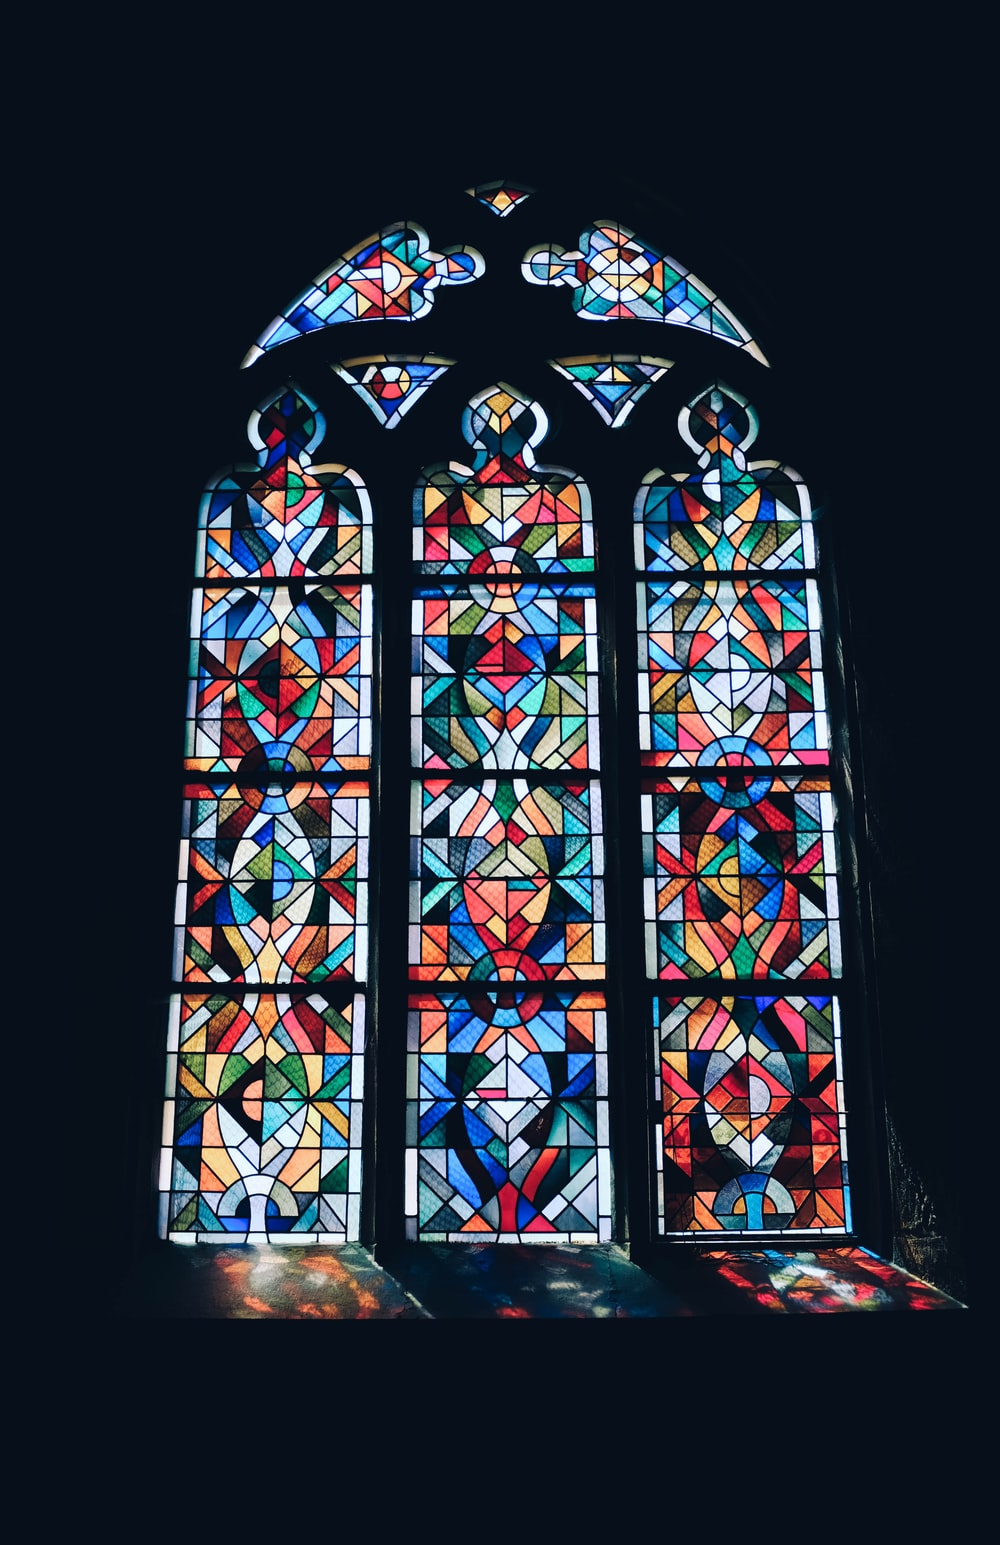 photo of multicolored glass mosaic windowpane